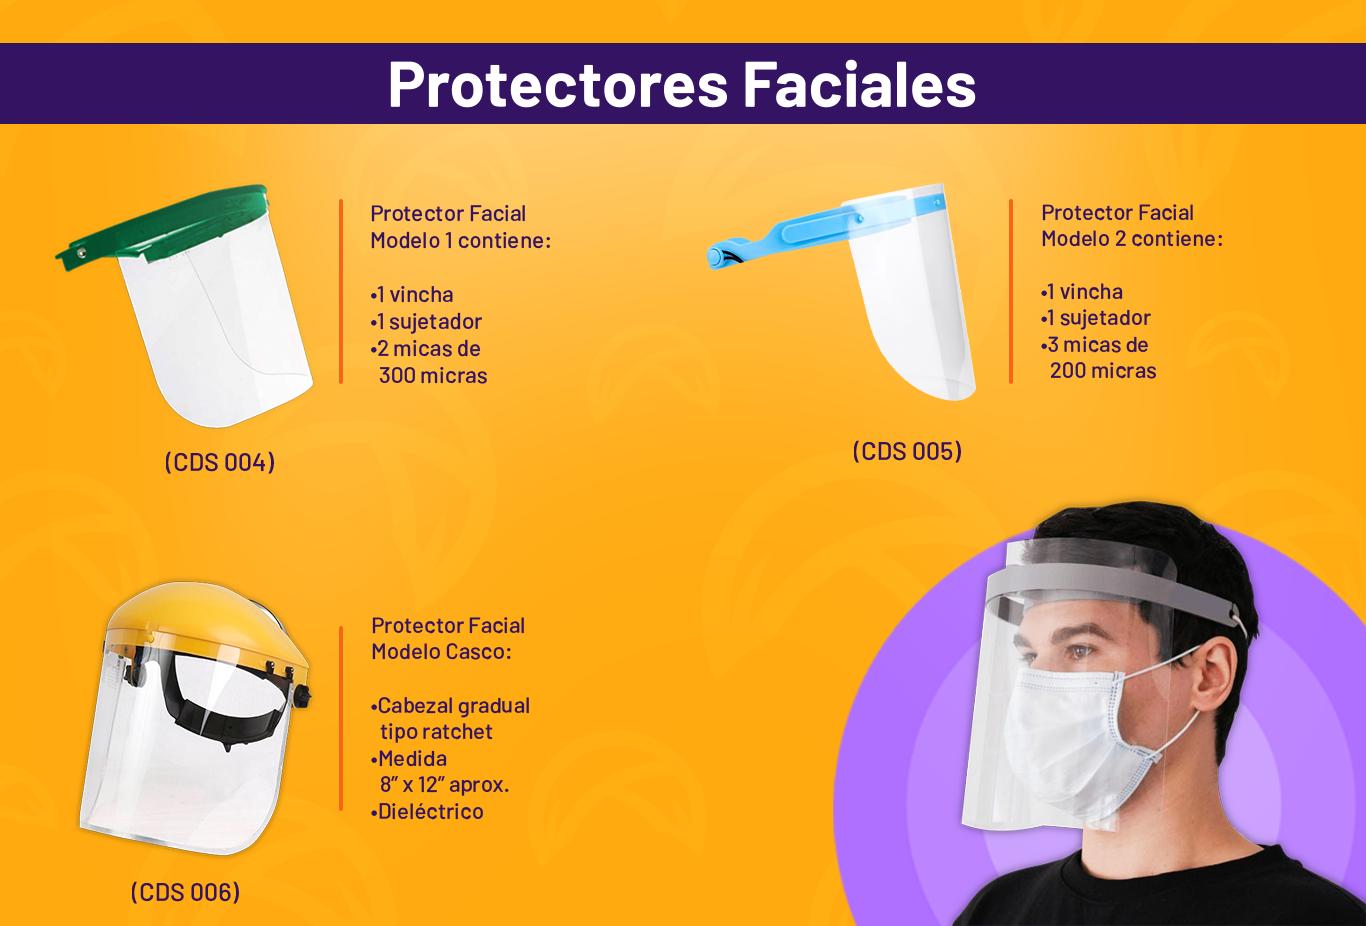 Landing Protectores Faciales.png